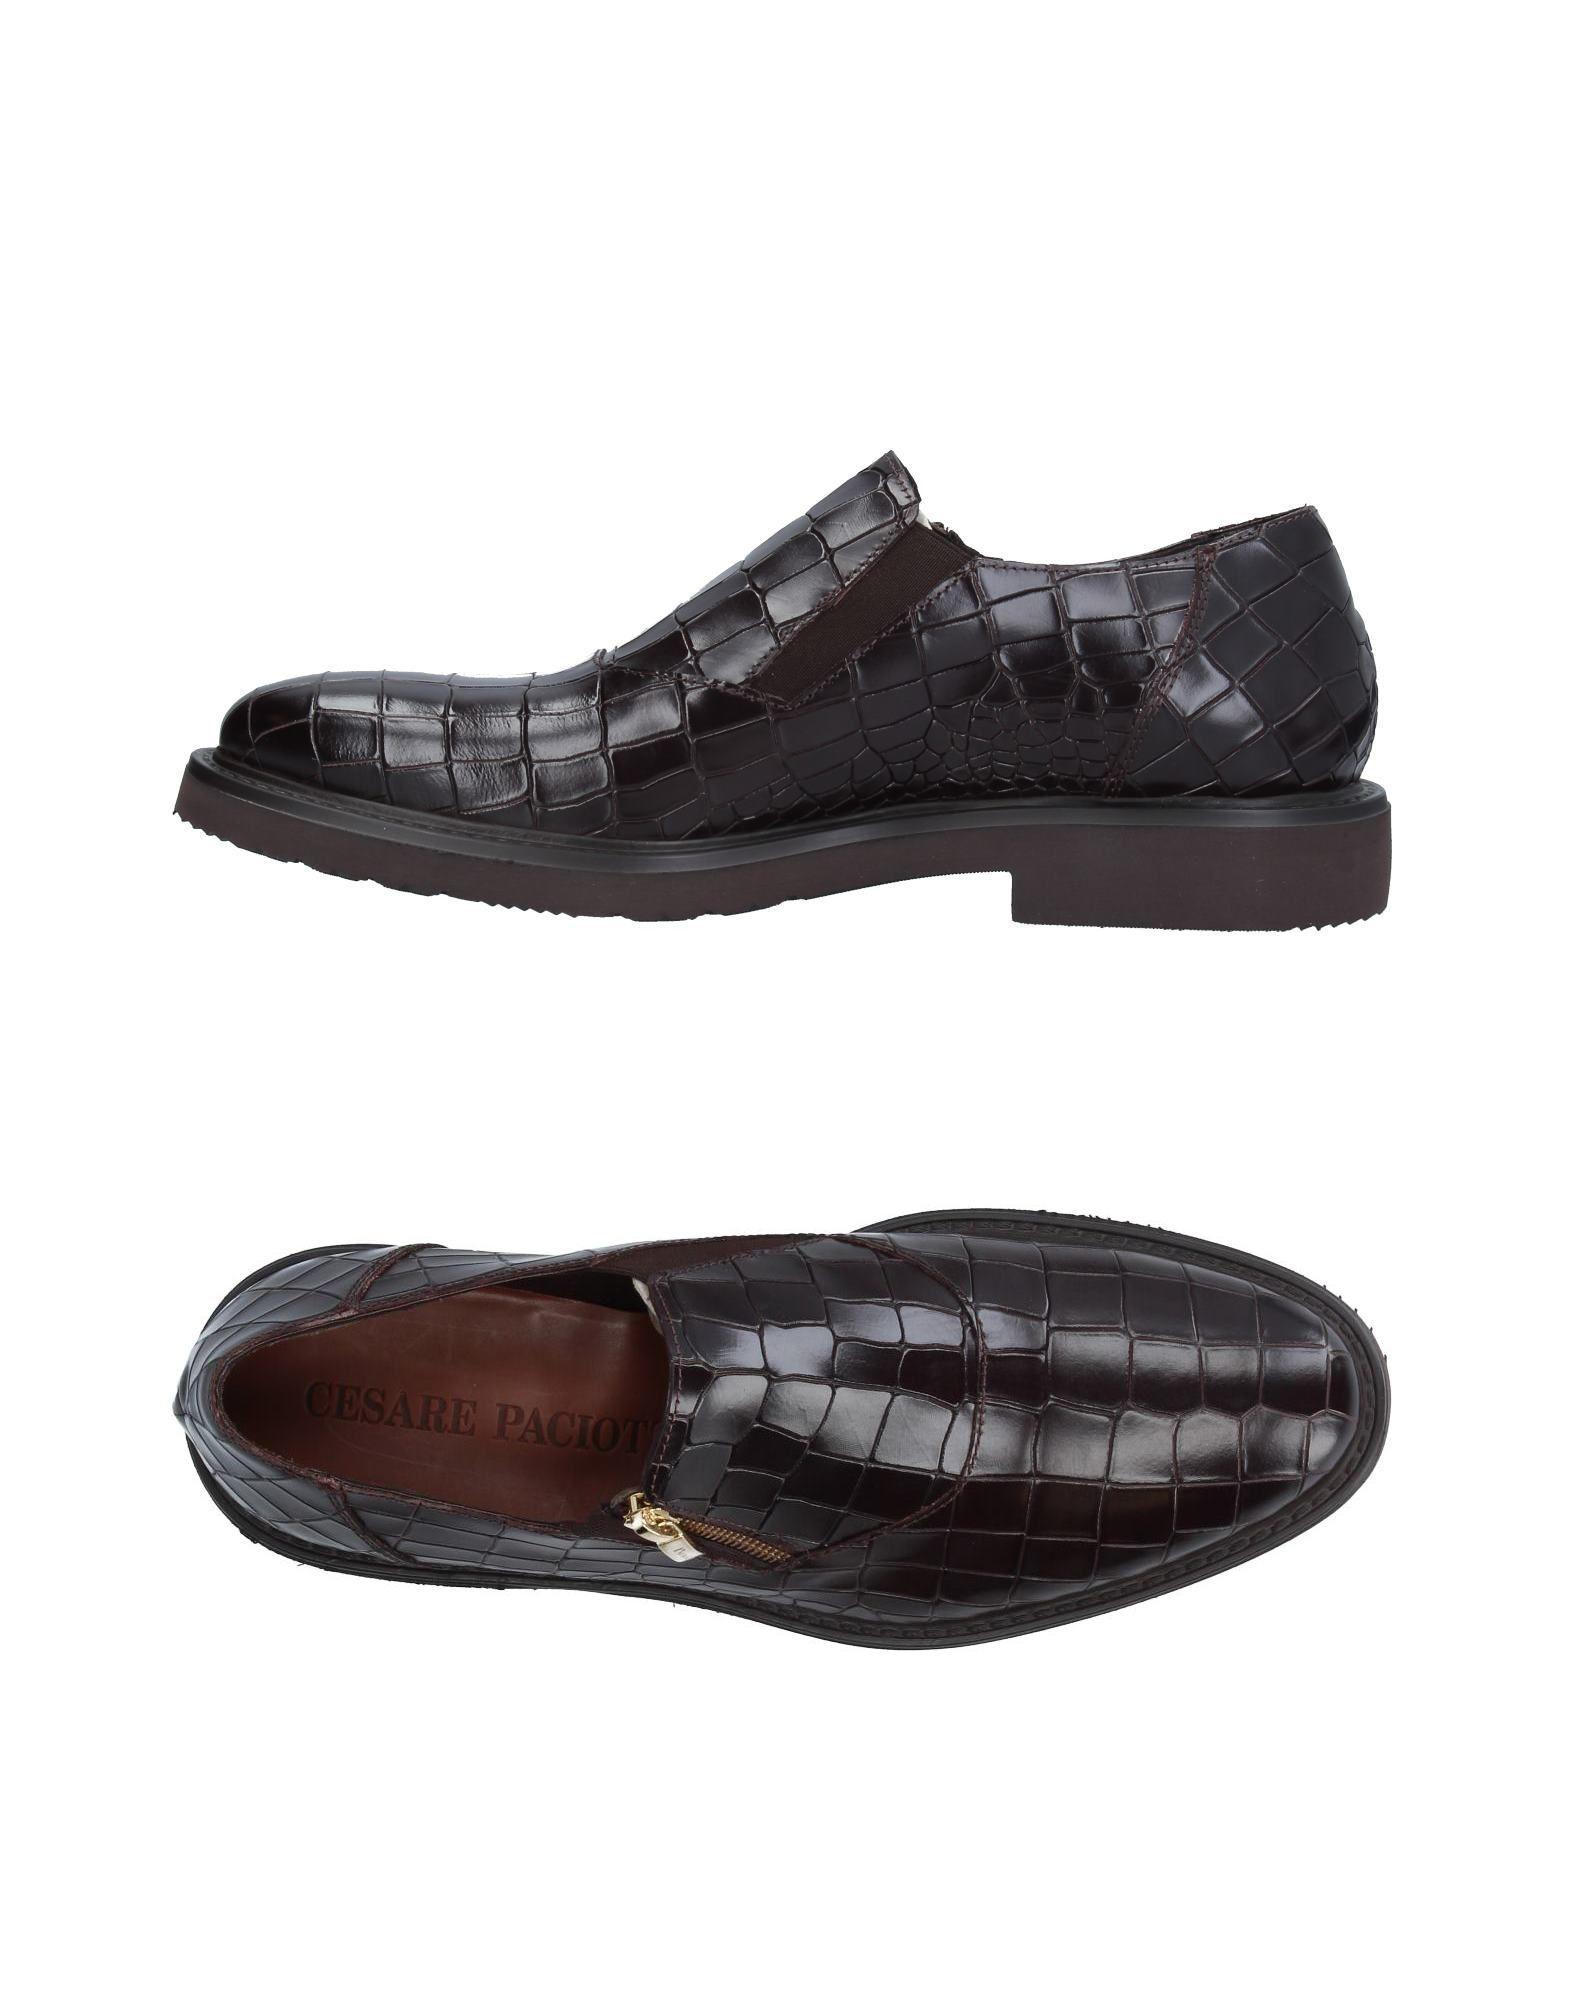 Cesare Paciotti Mokassins Herren  11326297UL Gute Qualität beliebte Schuhe